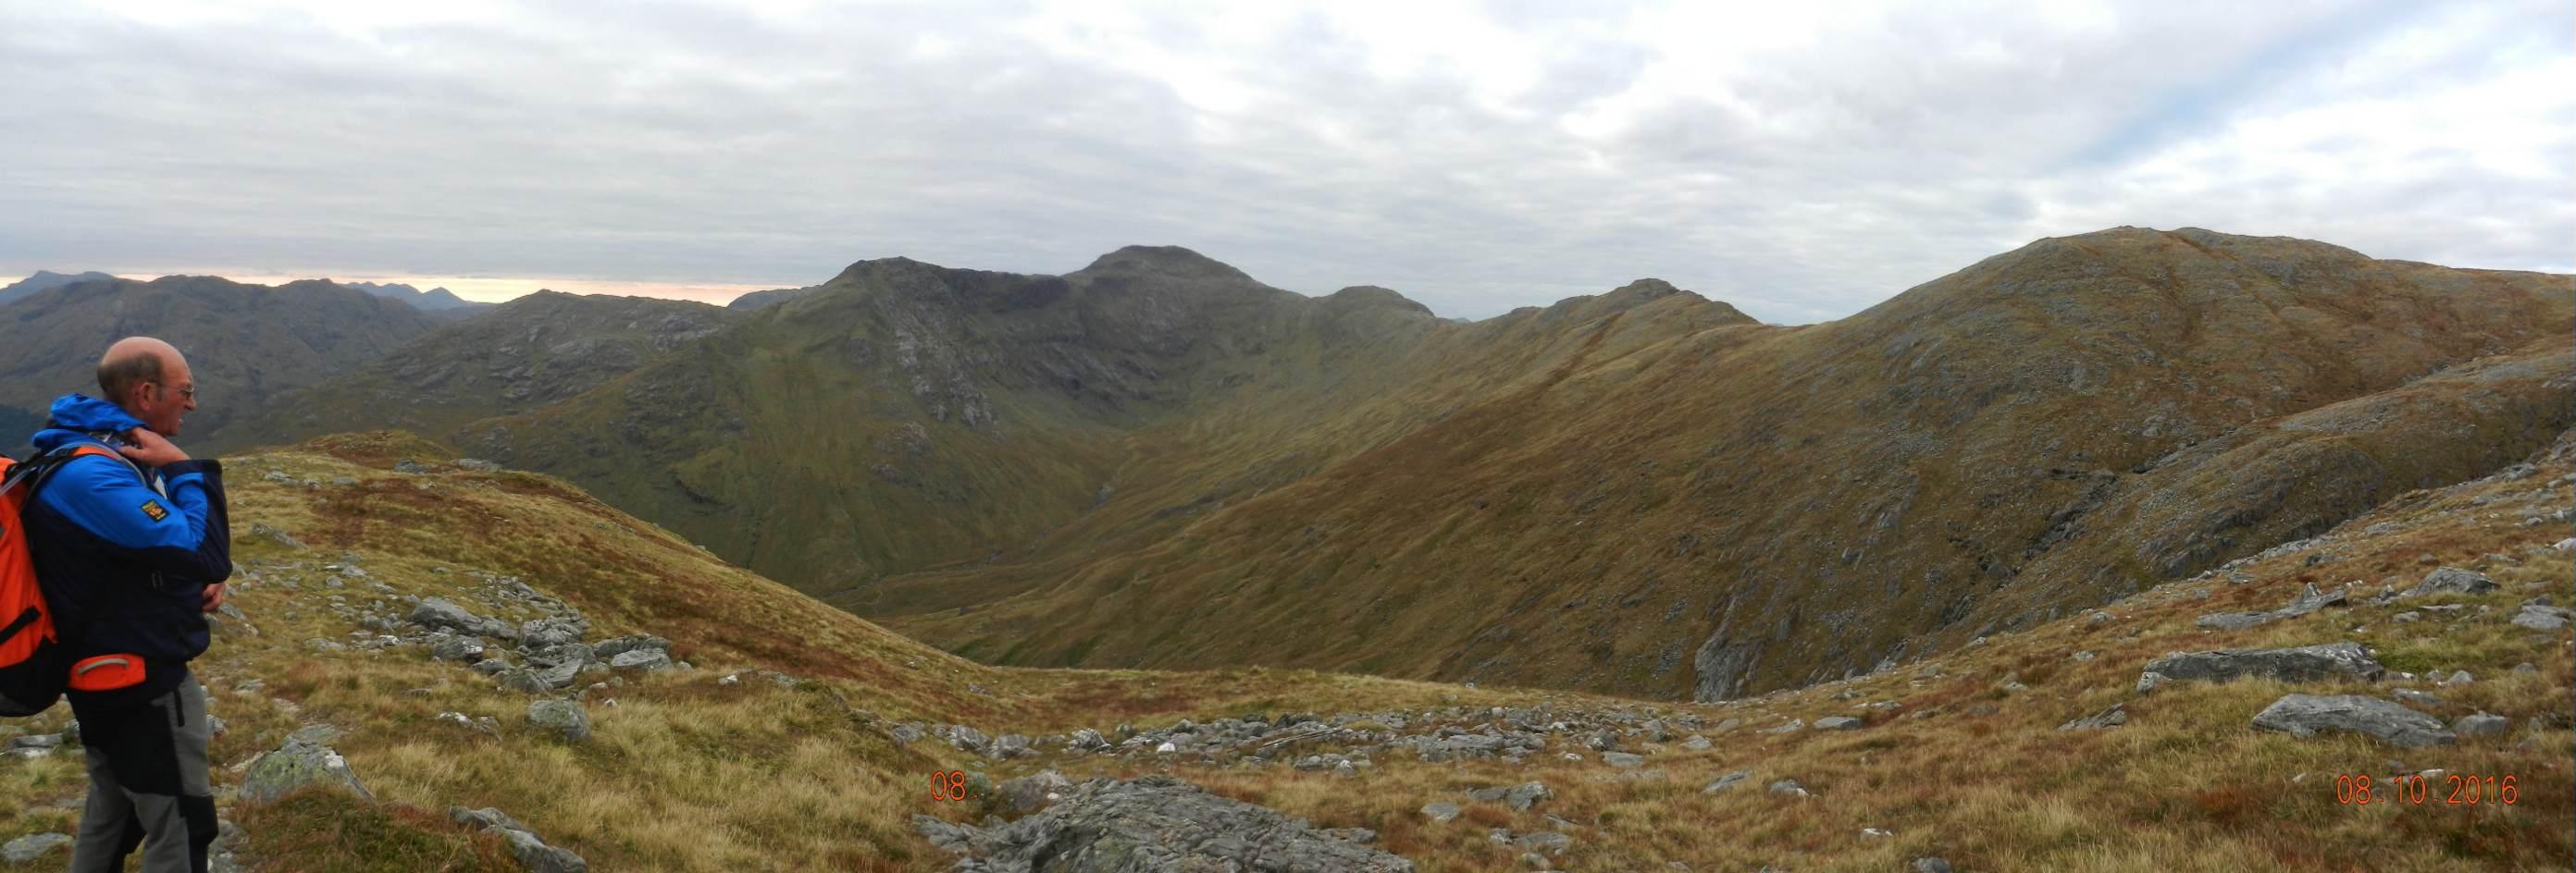 dscn4669-panorama